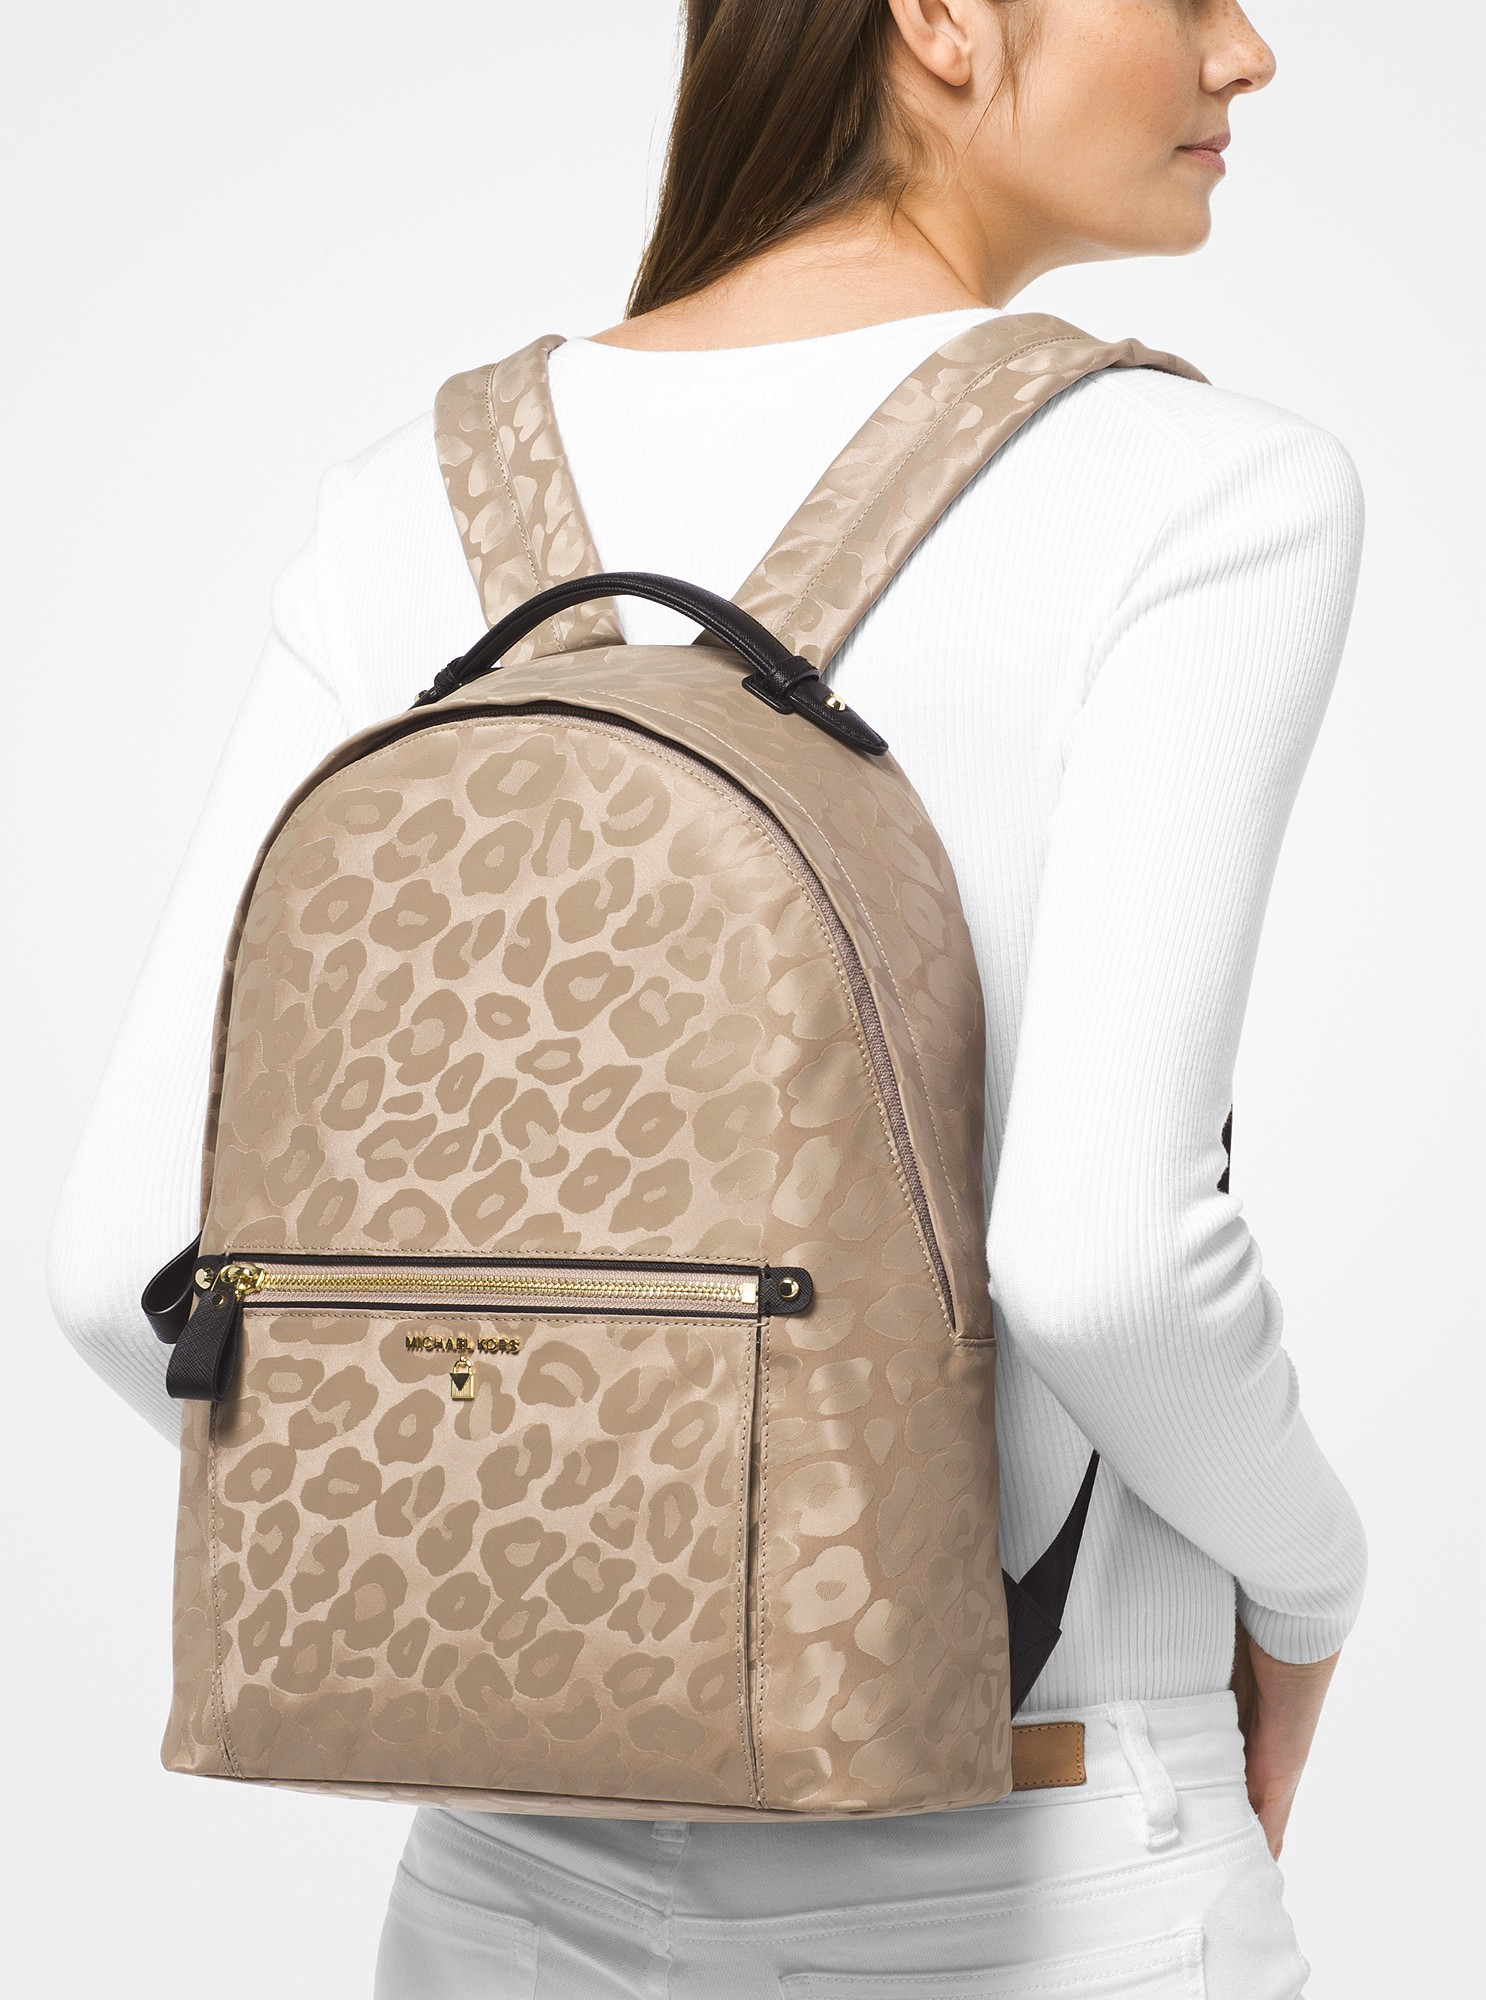 656b65fe45b5 Michael Kors Kelsey Large Leopard Nylon Backpack - Truffle ...